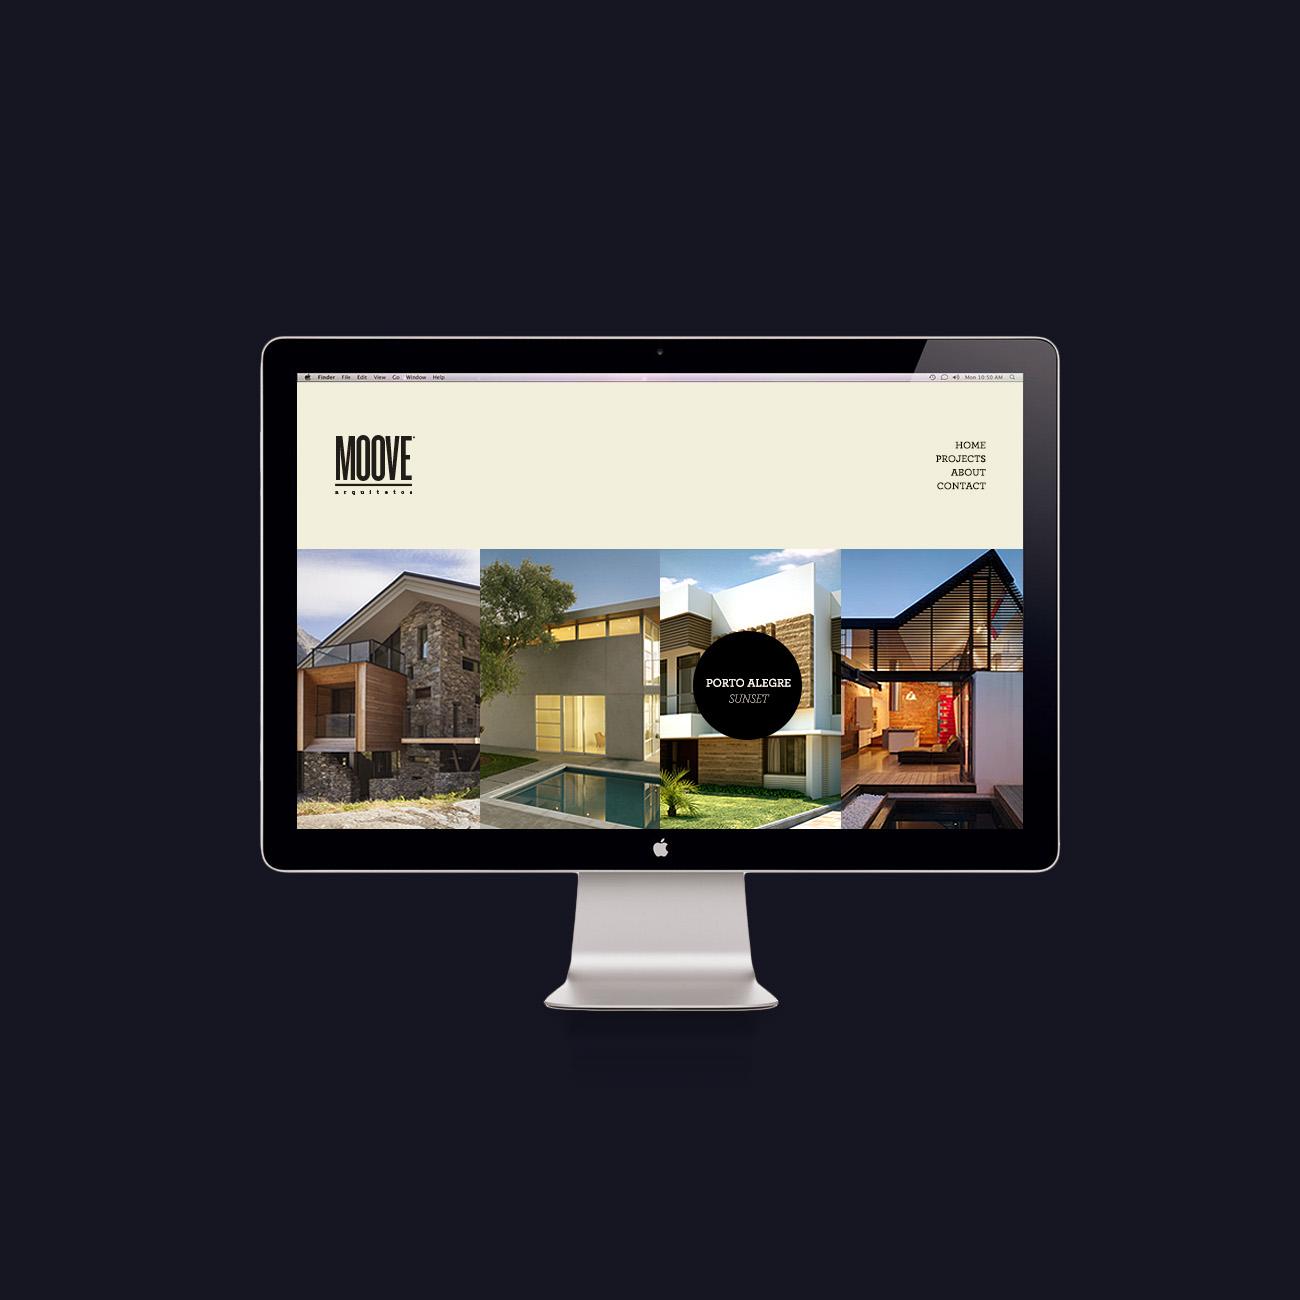 moove_site1